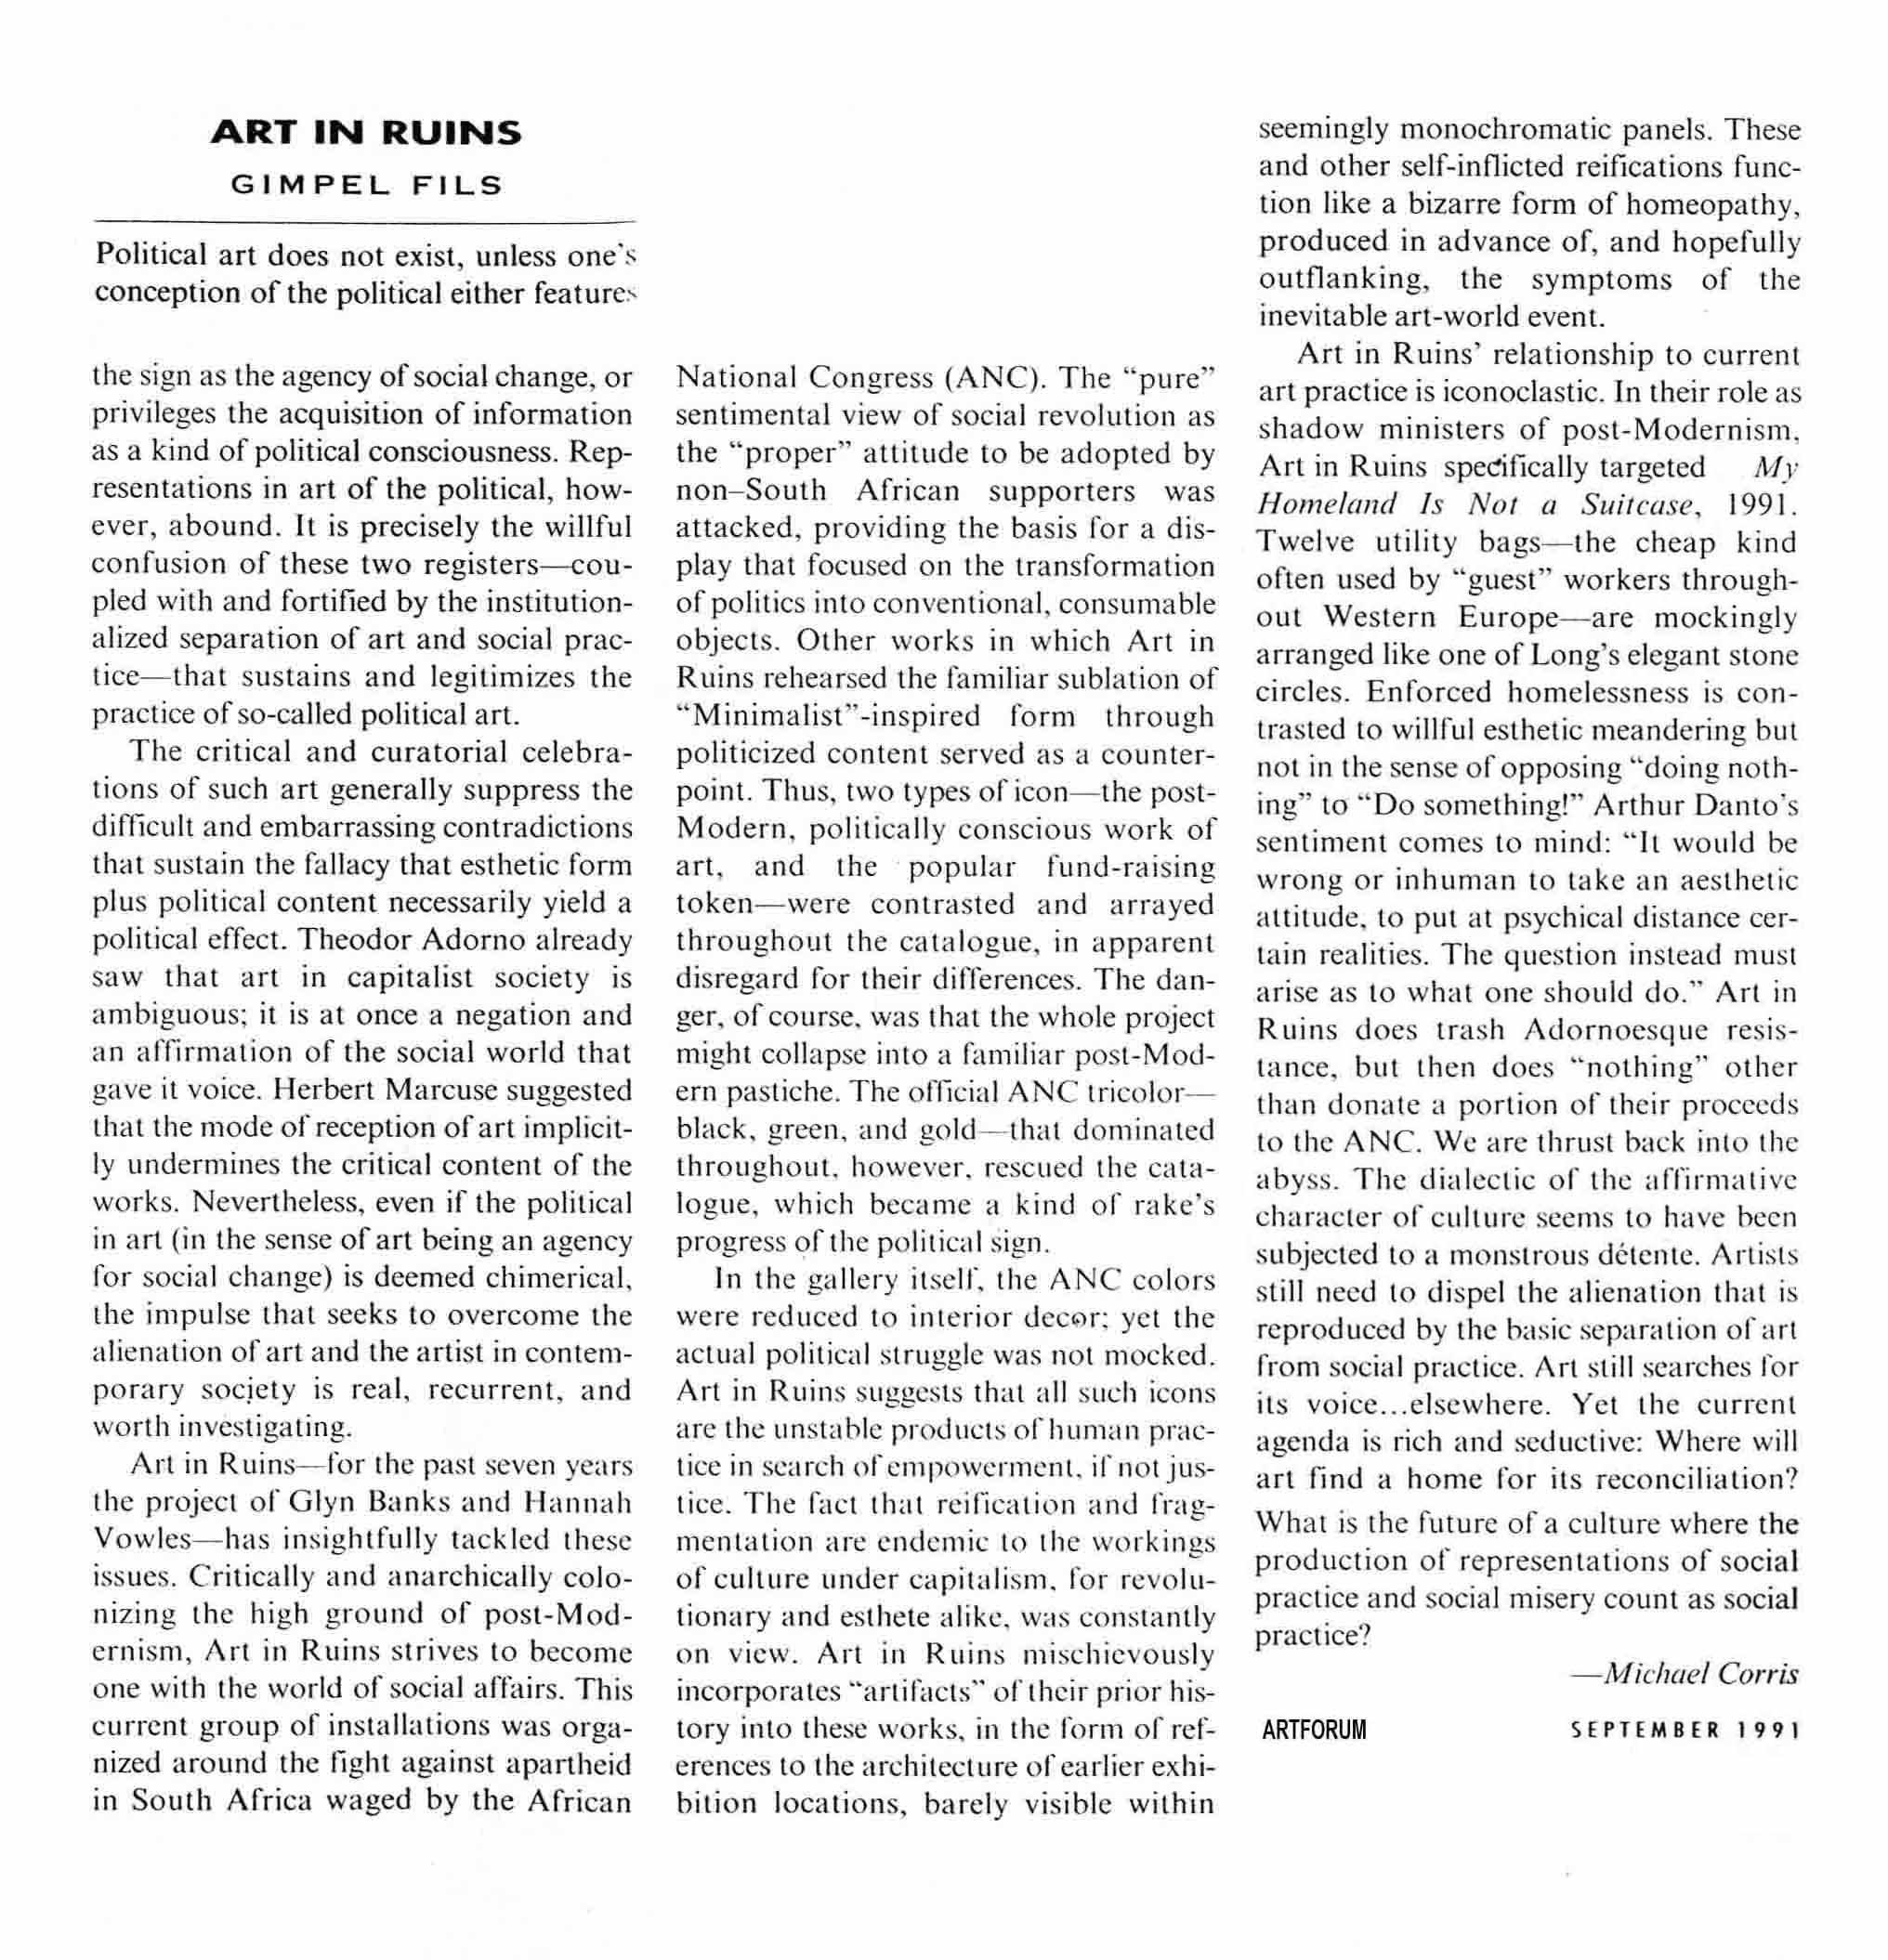 New Work, Gimpel Fils 1991.  Michael Corris Review. Double-Take Prague 2000